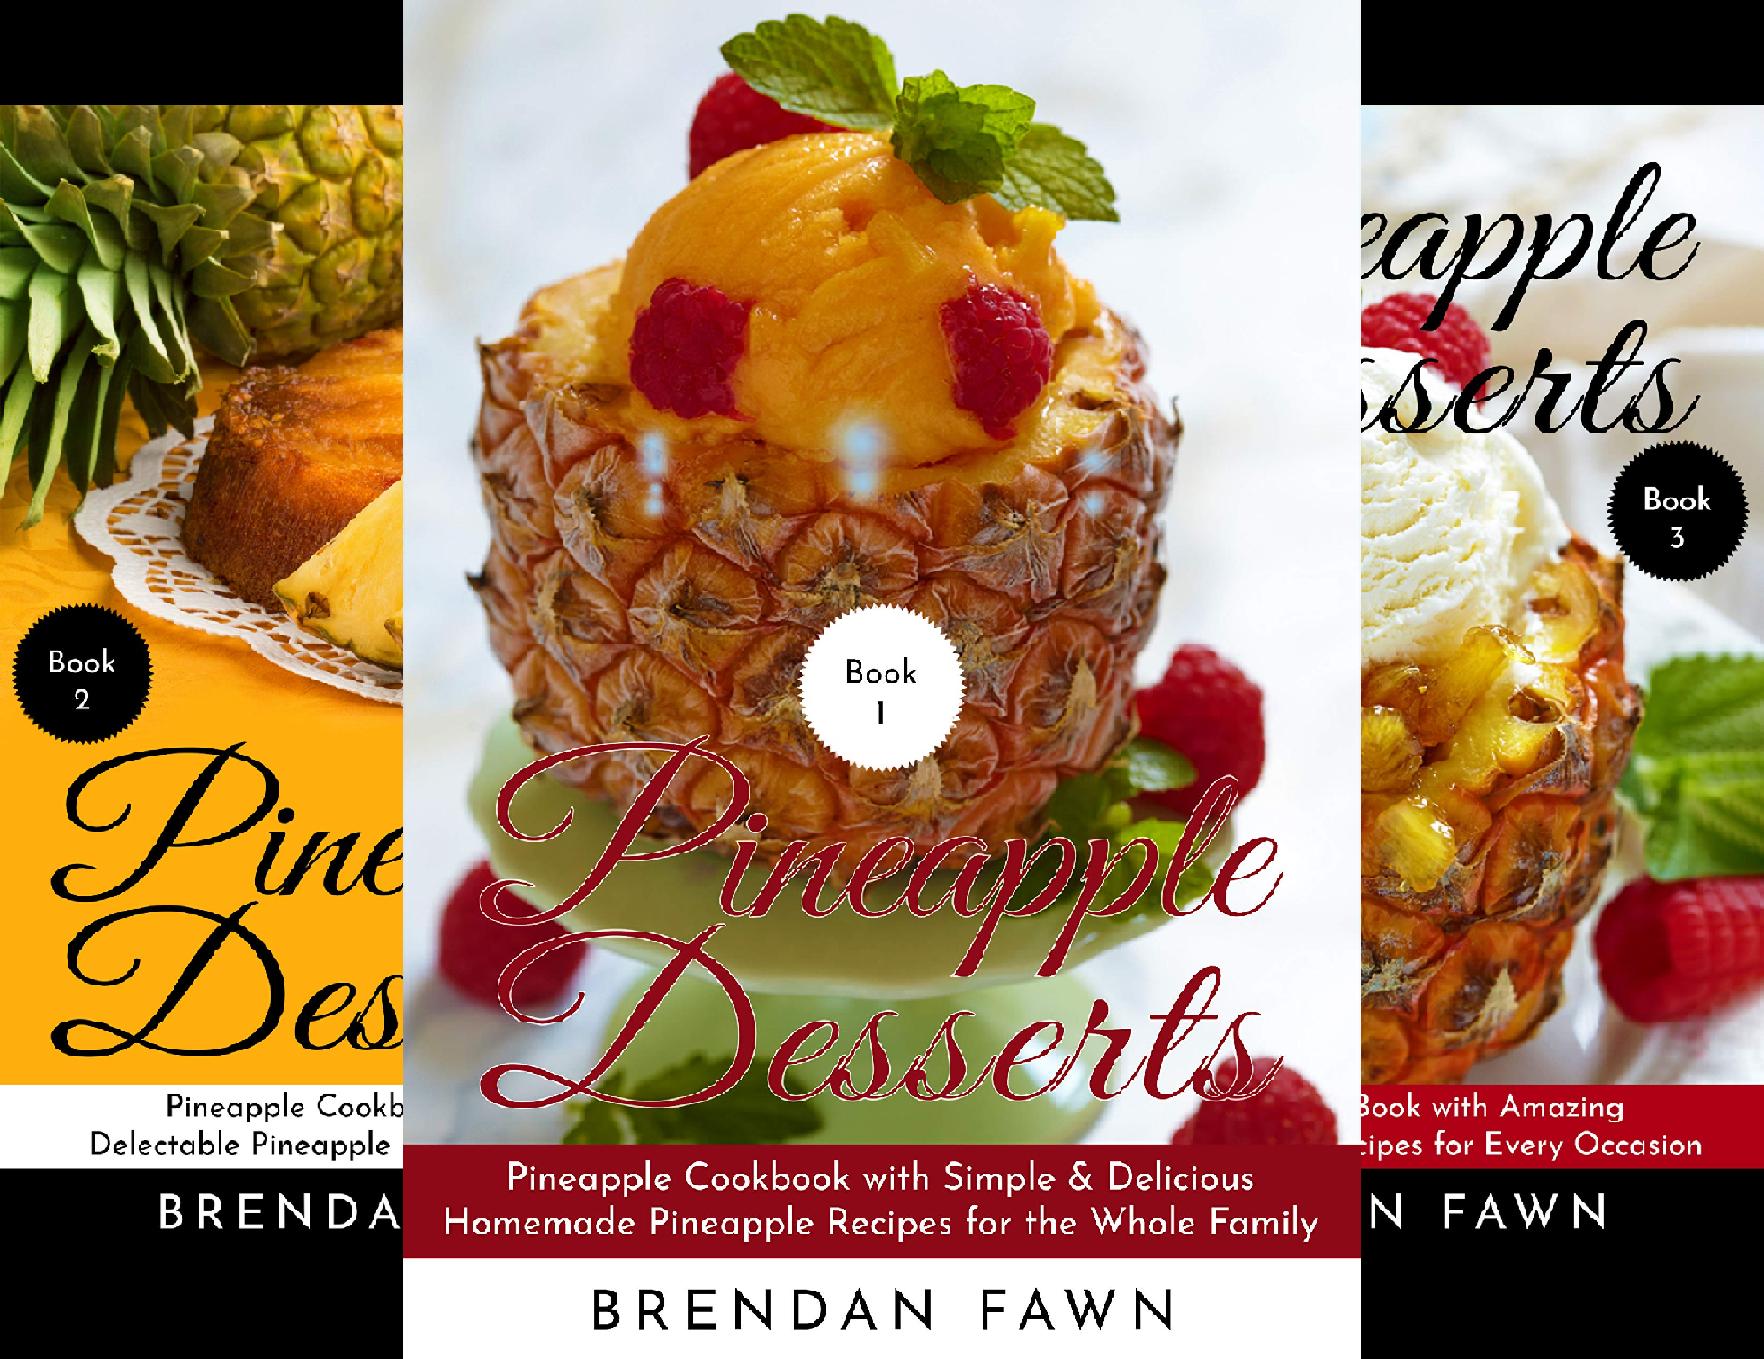 Delicious Pineapple Desserts (5 Book Series)